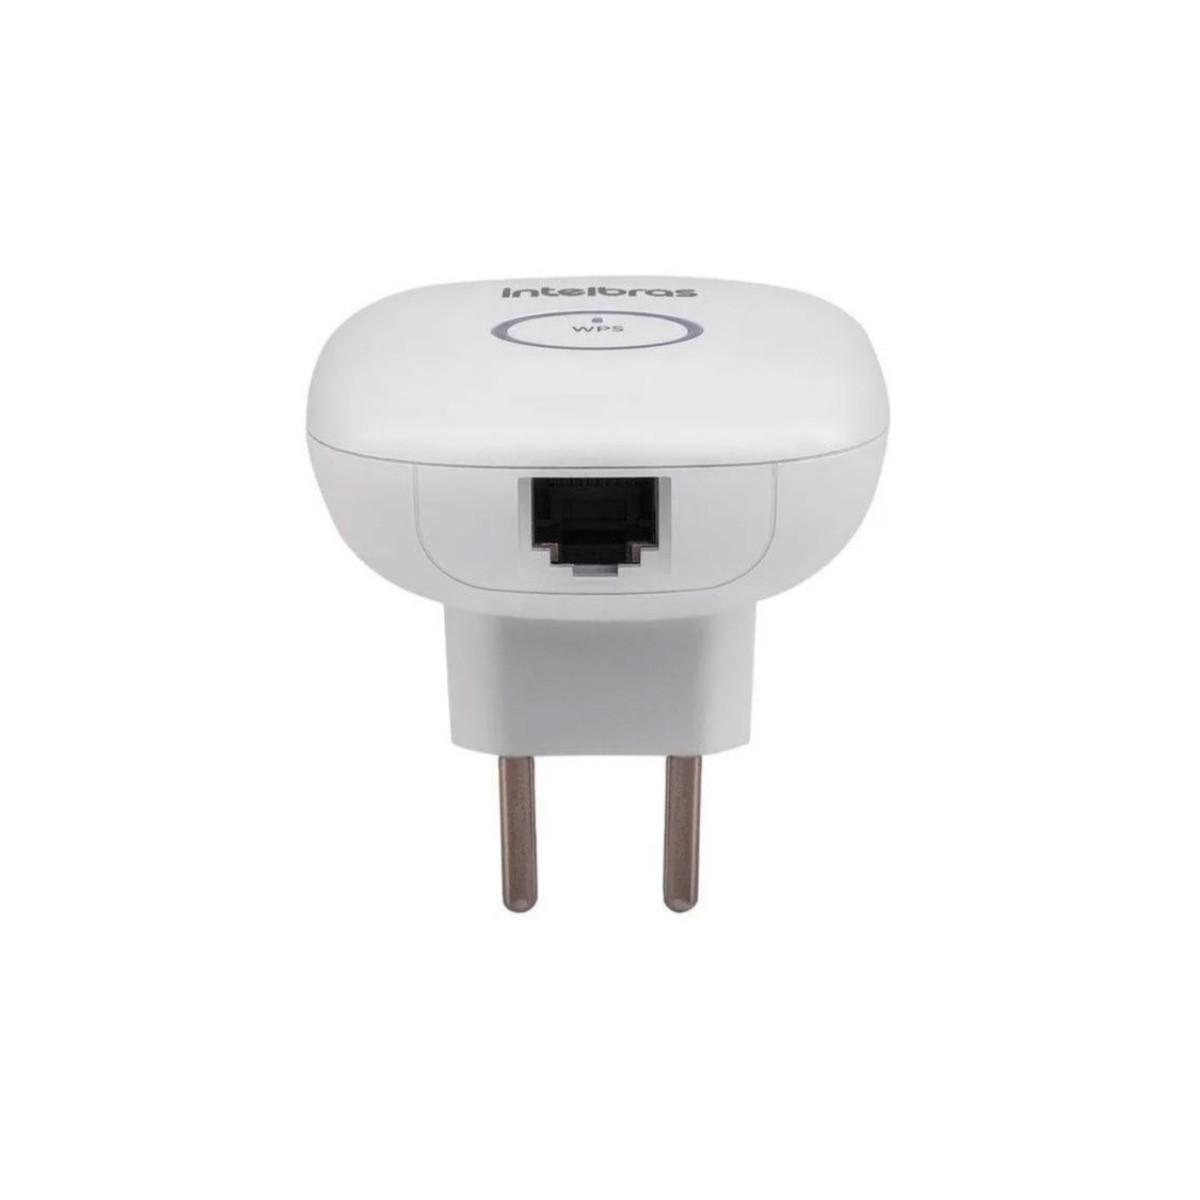 Repetidor, Access point Intelbras IWE 3000N branco 100V/240V